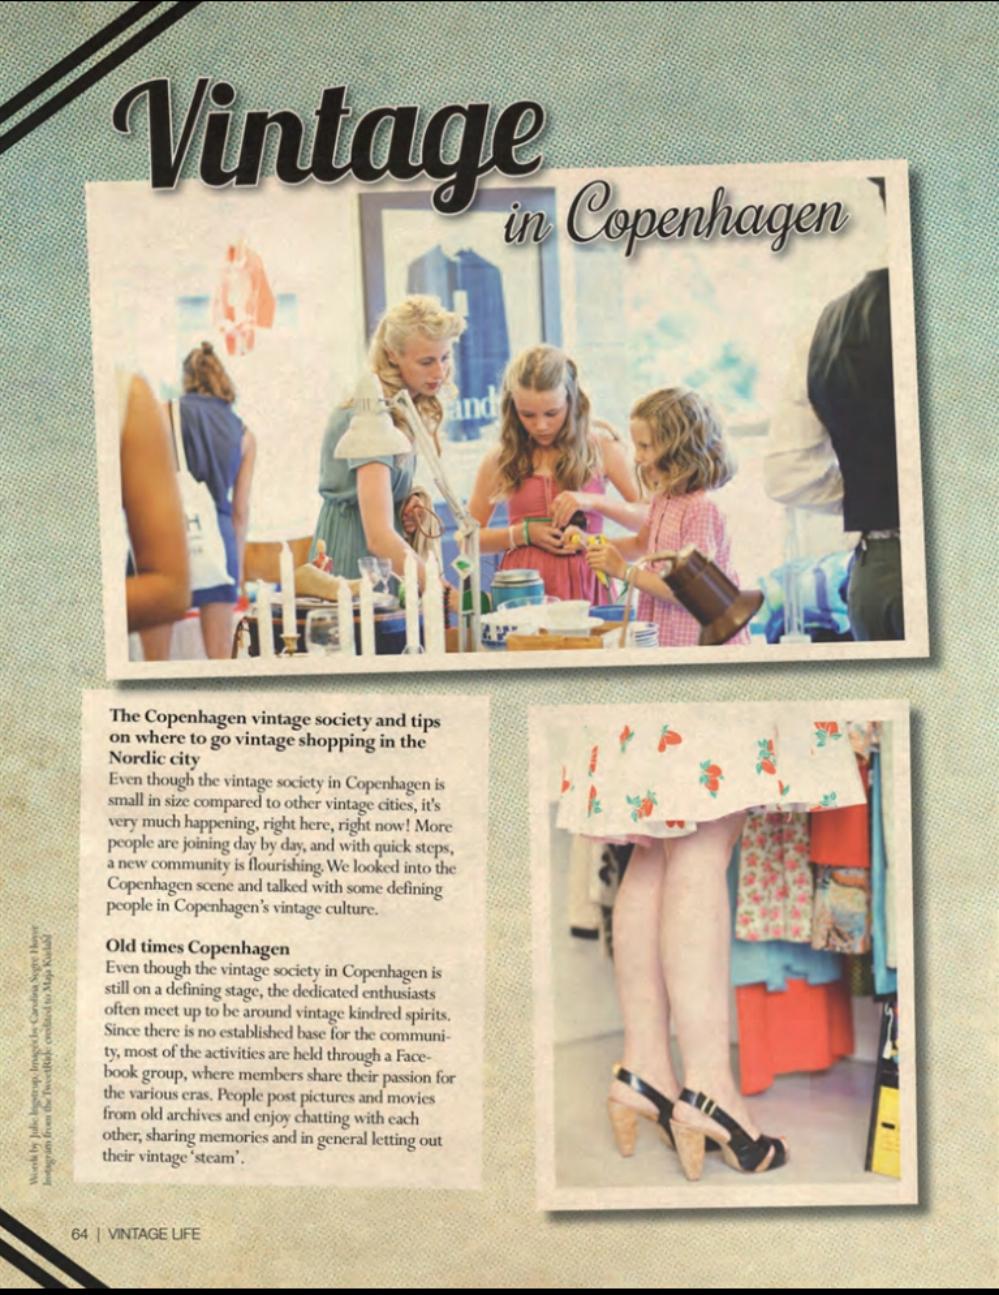 VintageLifeMag_CopenhagenTreasures